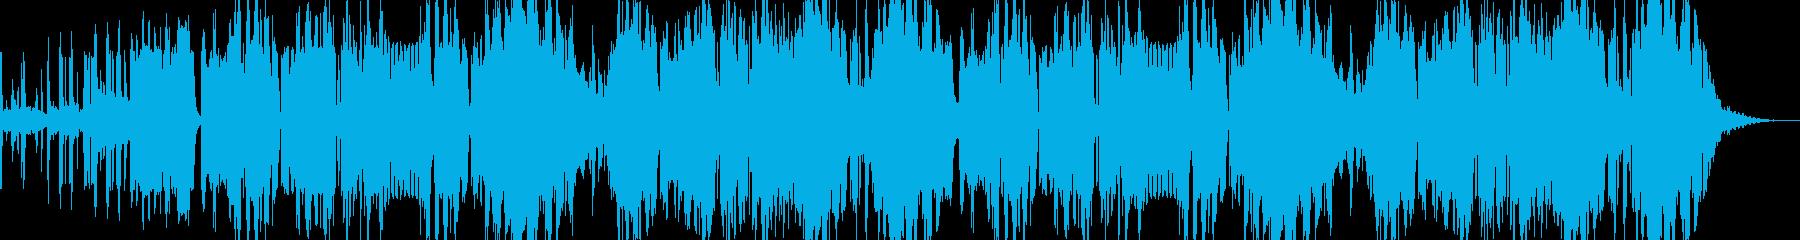 【CM】ダークな雰囲気を演出した一曲 の再生済みの波形